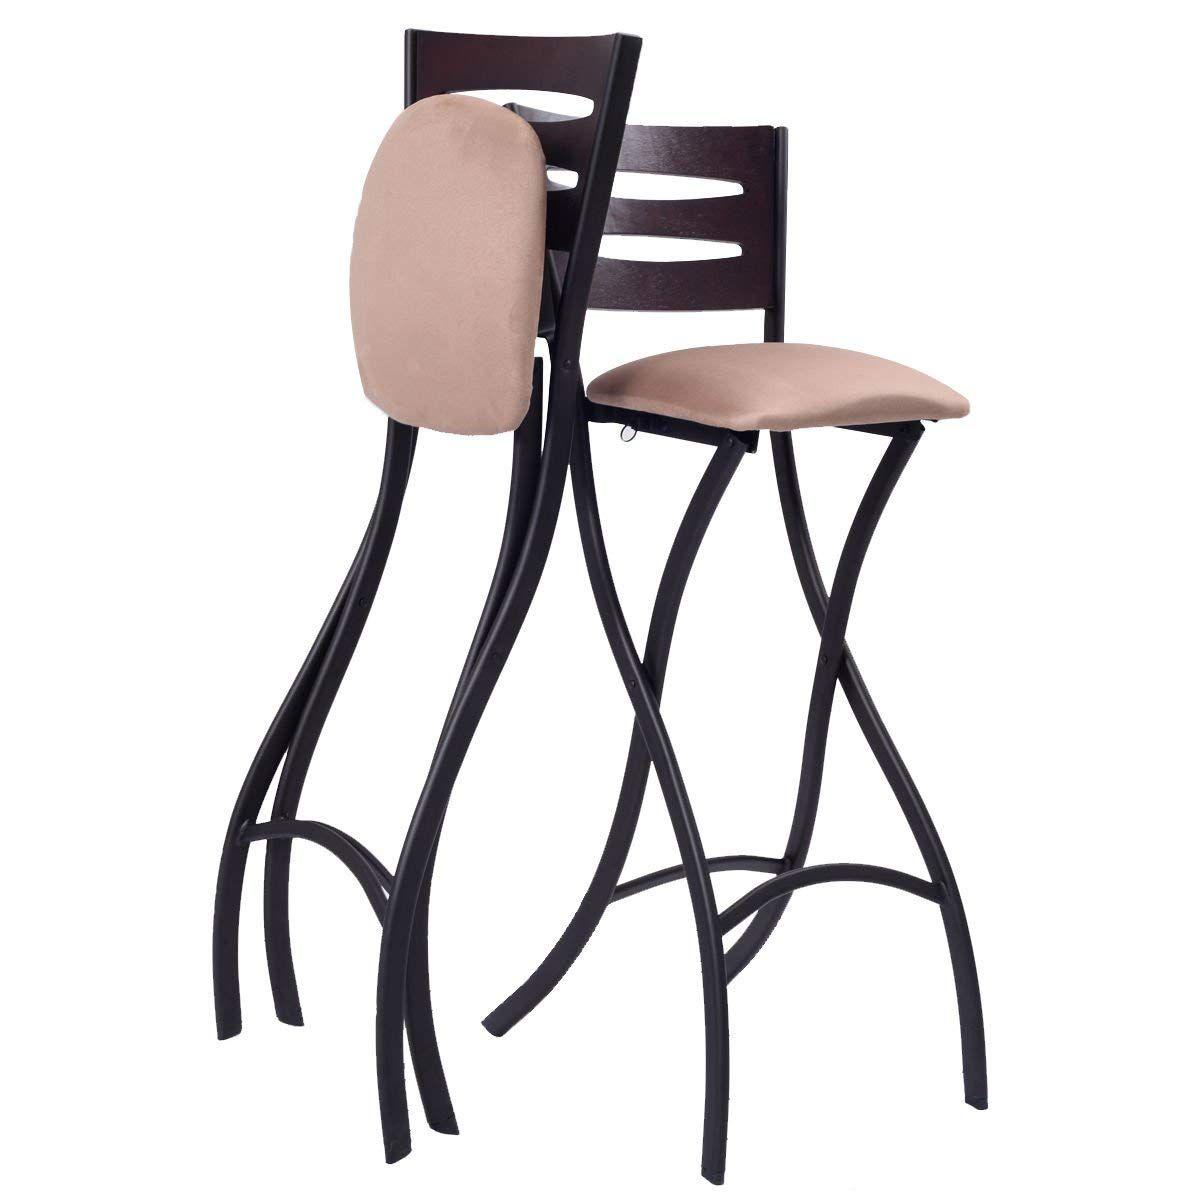 Folding Counter Bar Stools Bistro Dining Kitchen   Bar stools ...